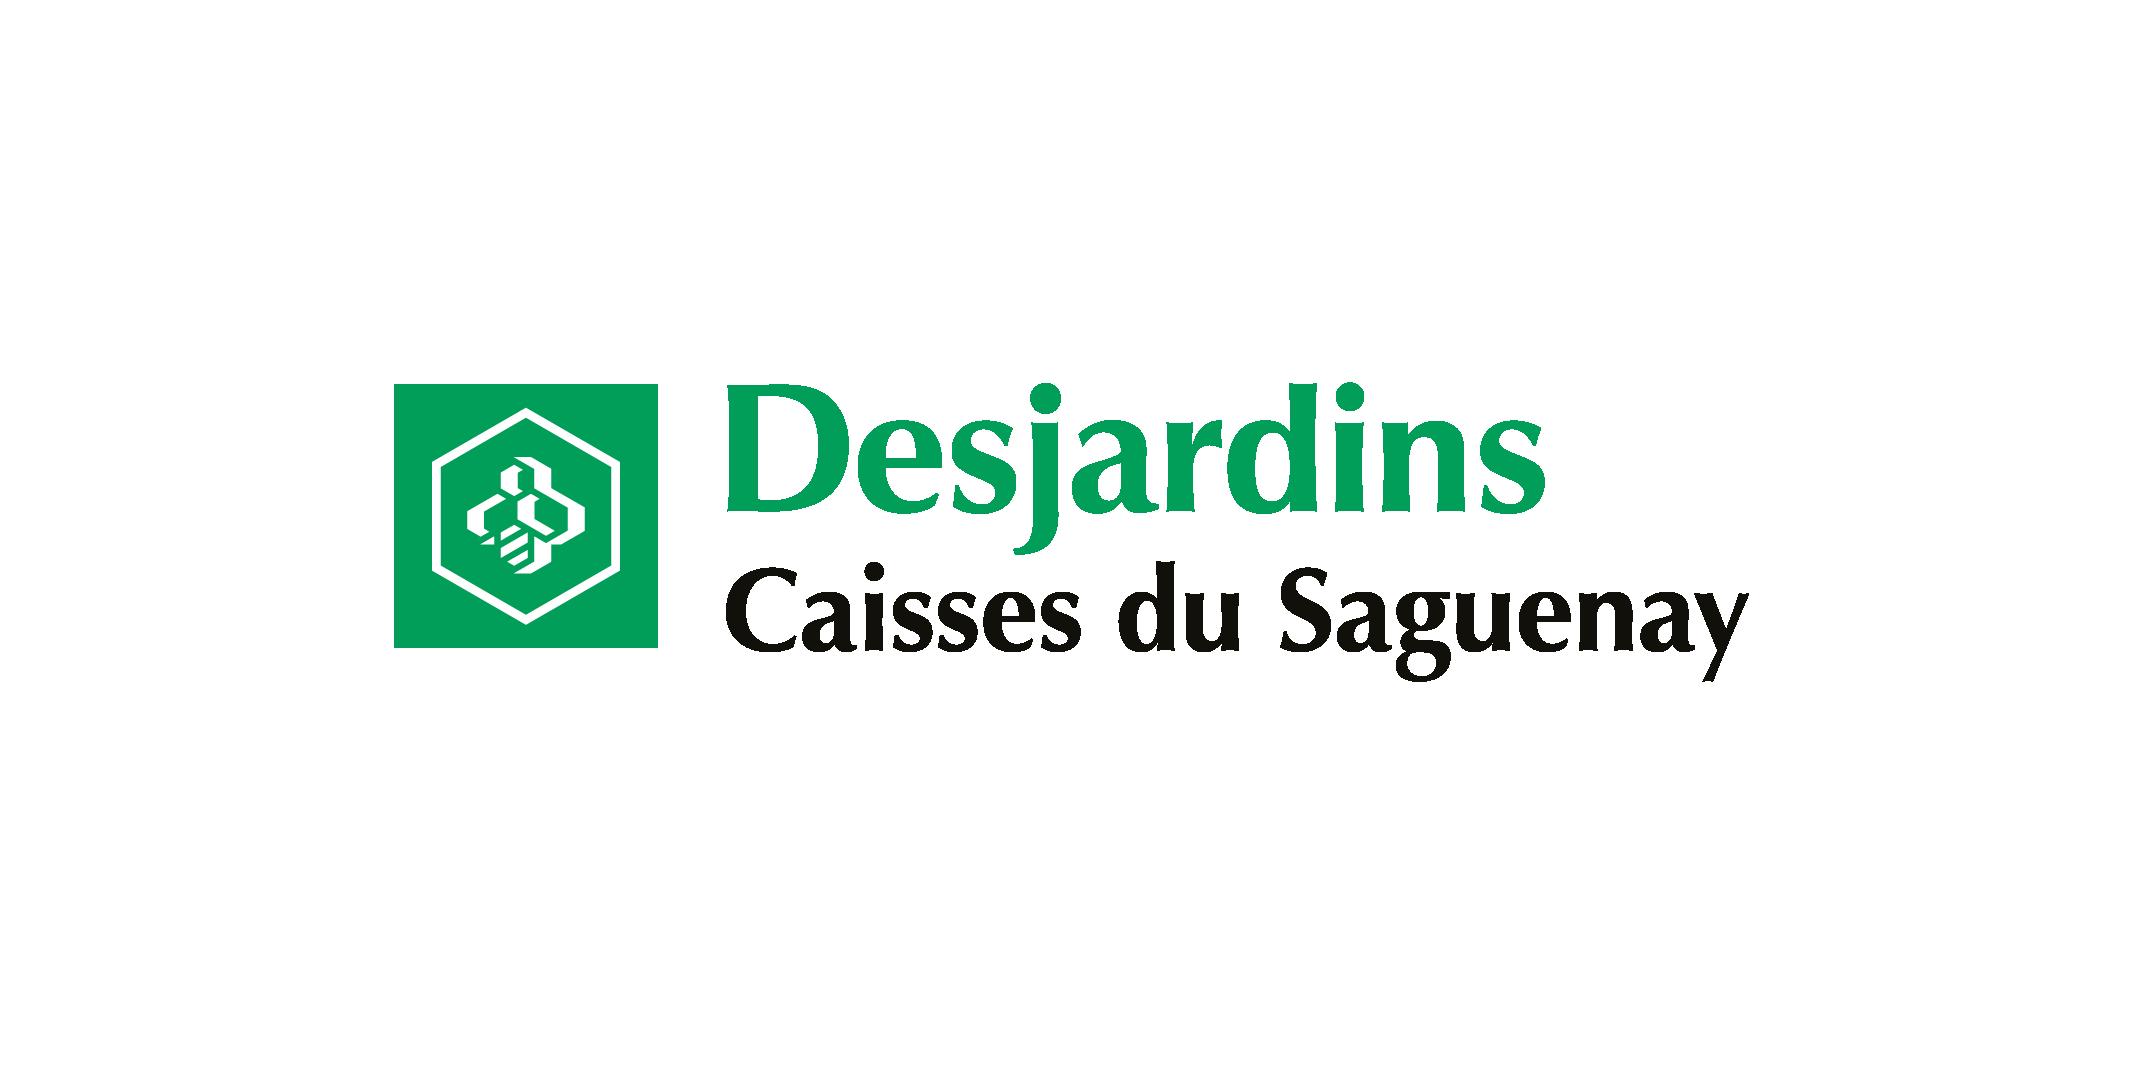 Caisses Desjardins de Saguenay